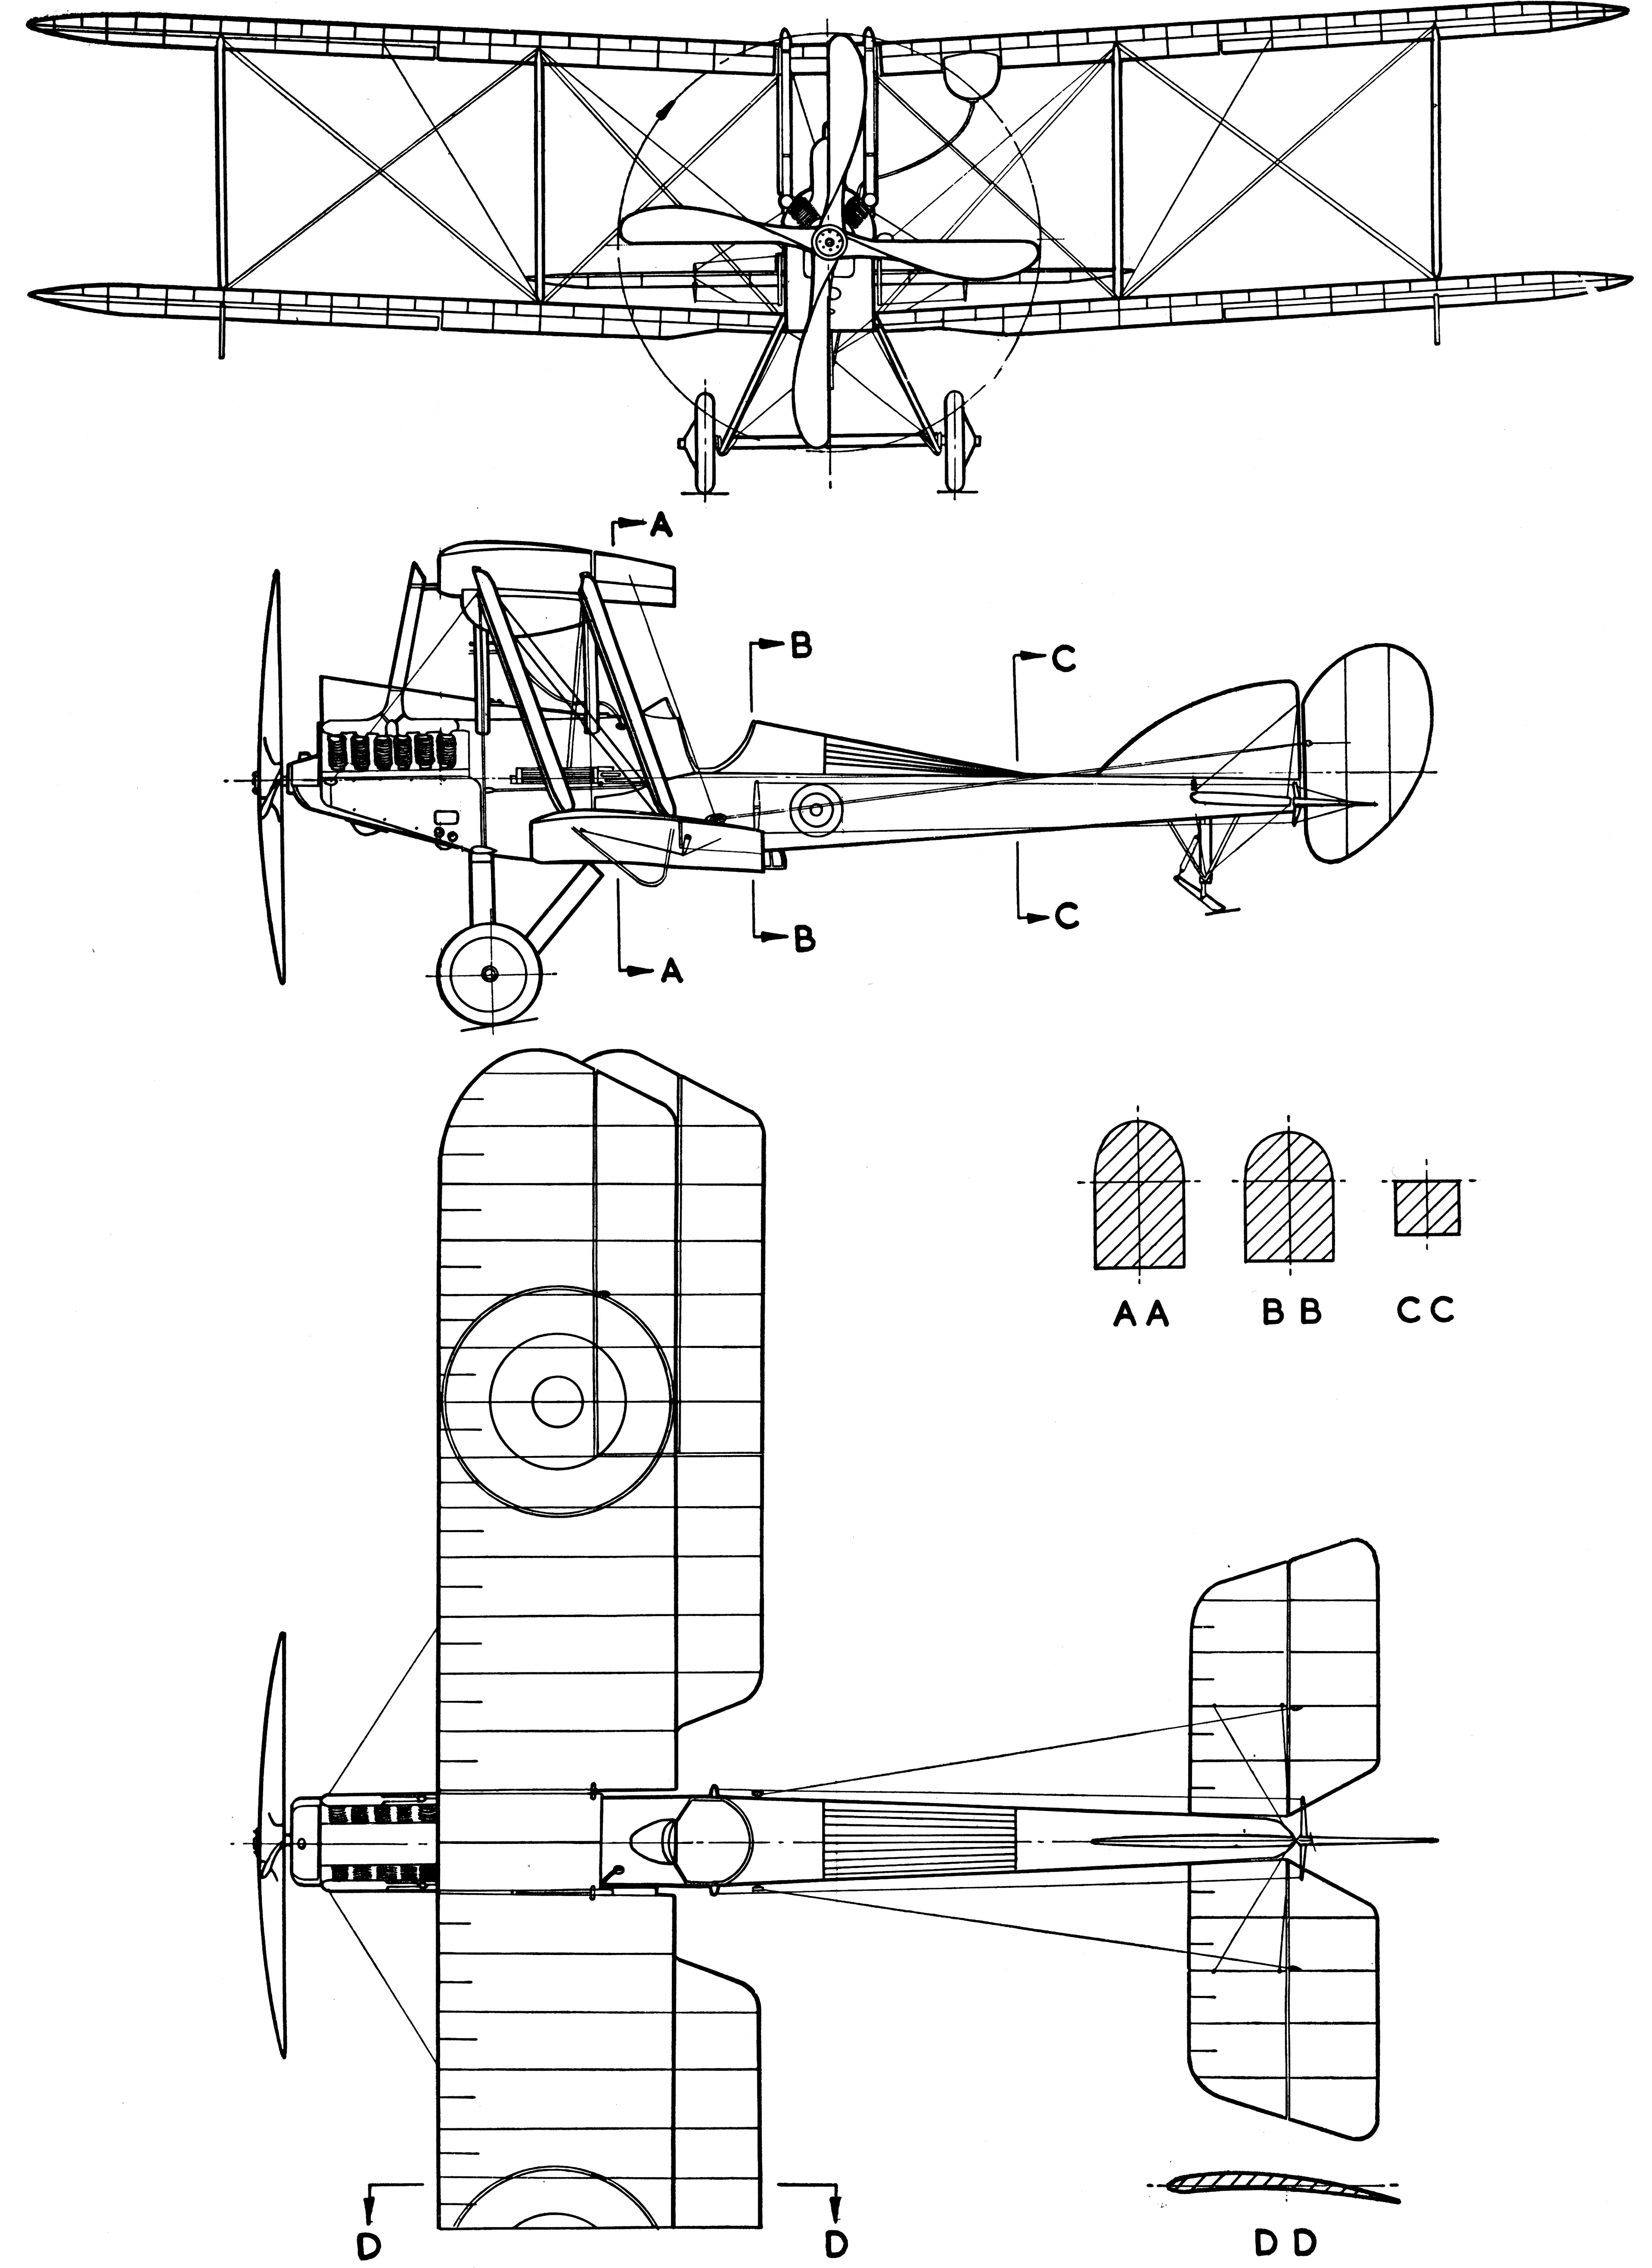 B.E.12 blueprint